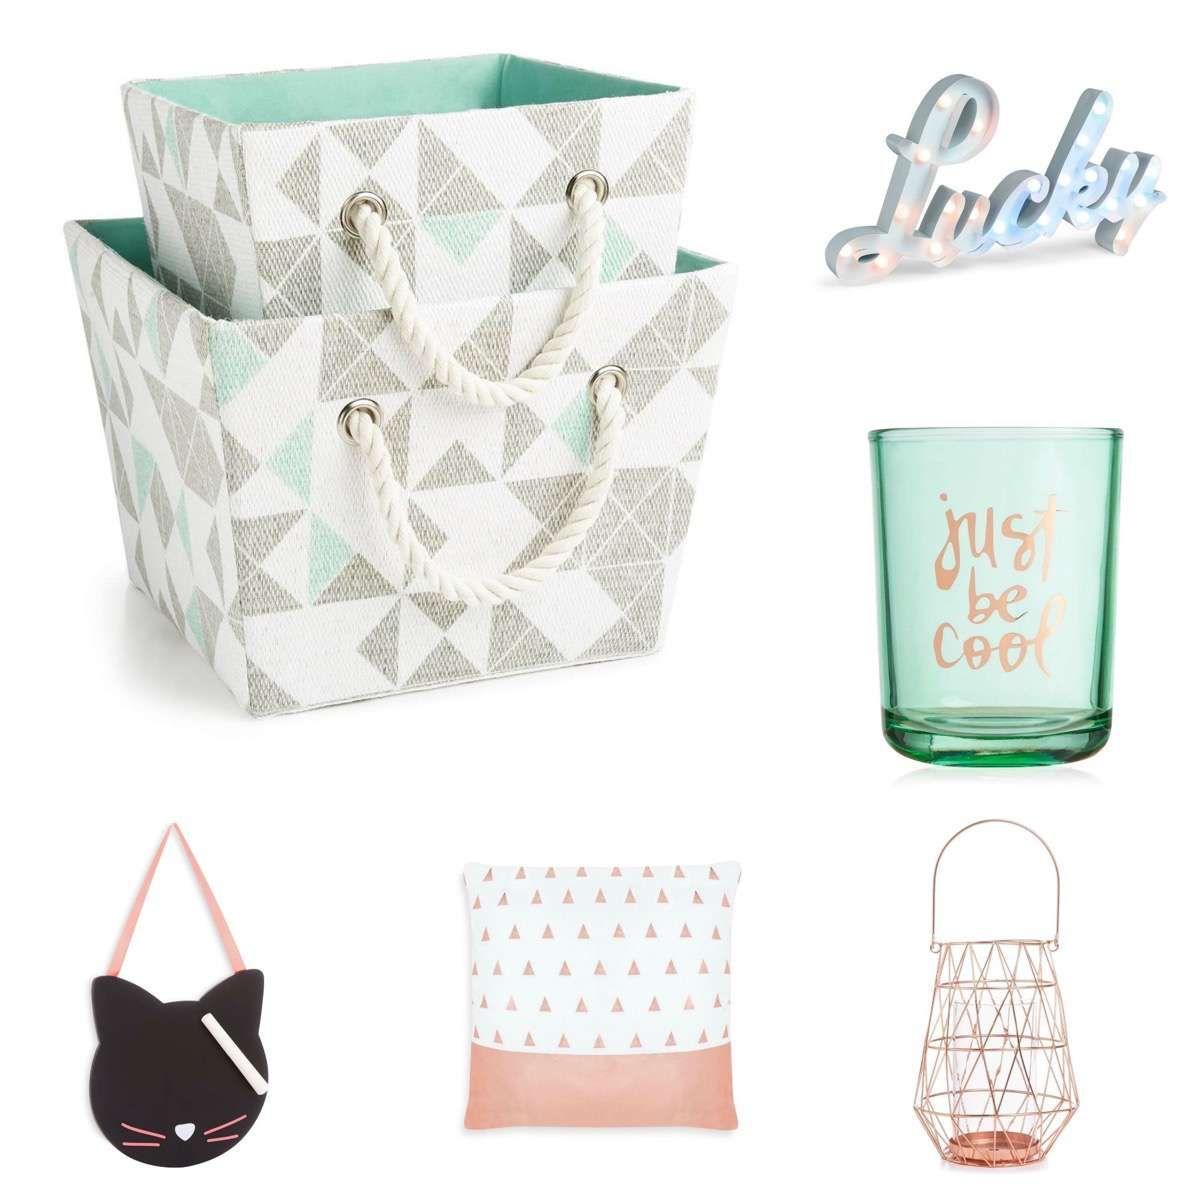 Novedades cat logo de primark home 2016 cat logo vasos for Cosas de casa decoracion catalogo